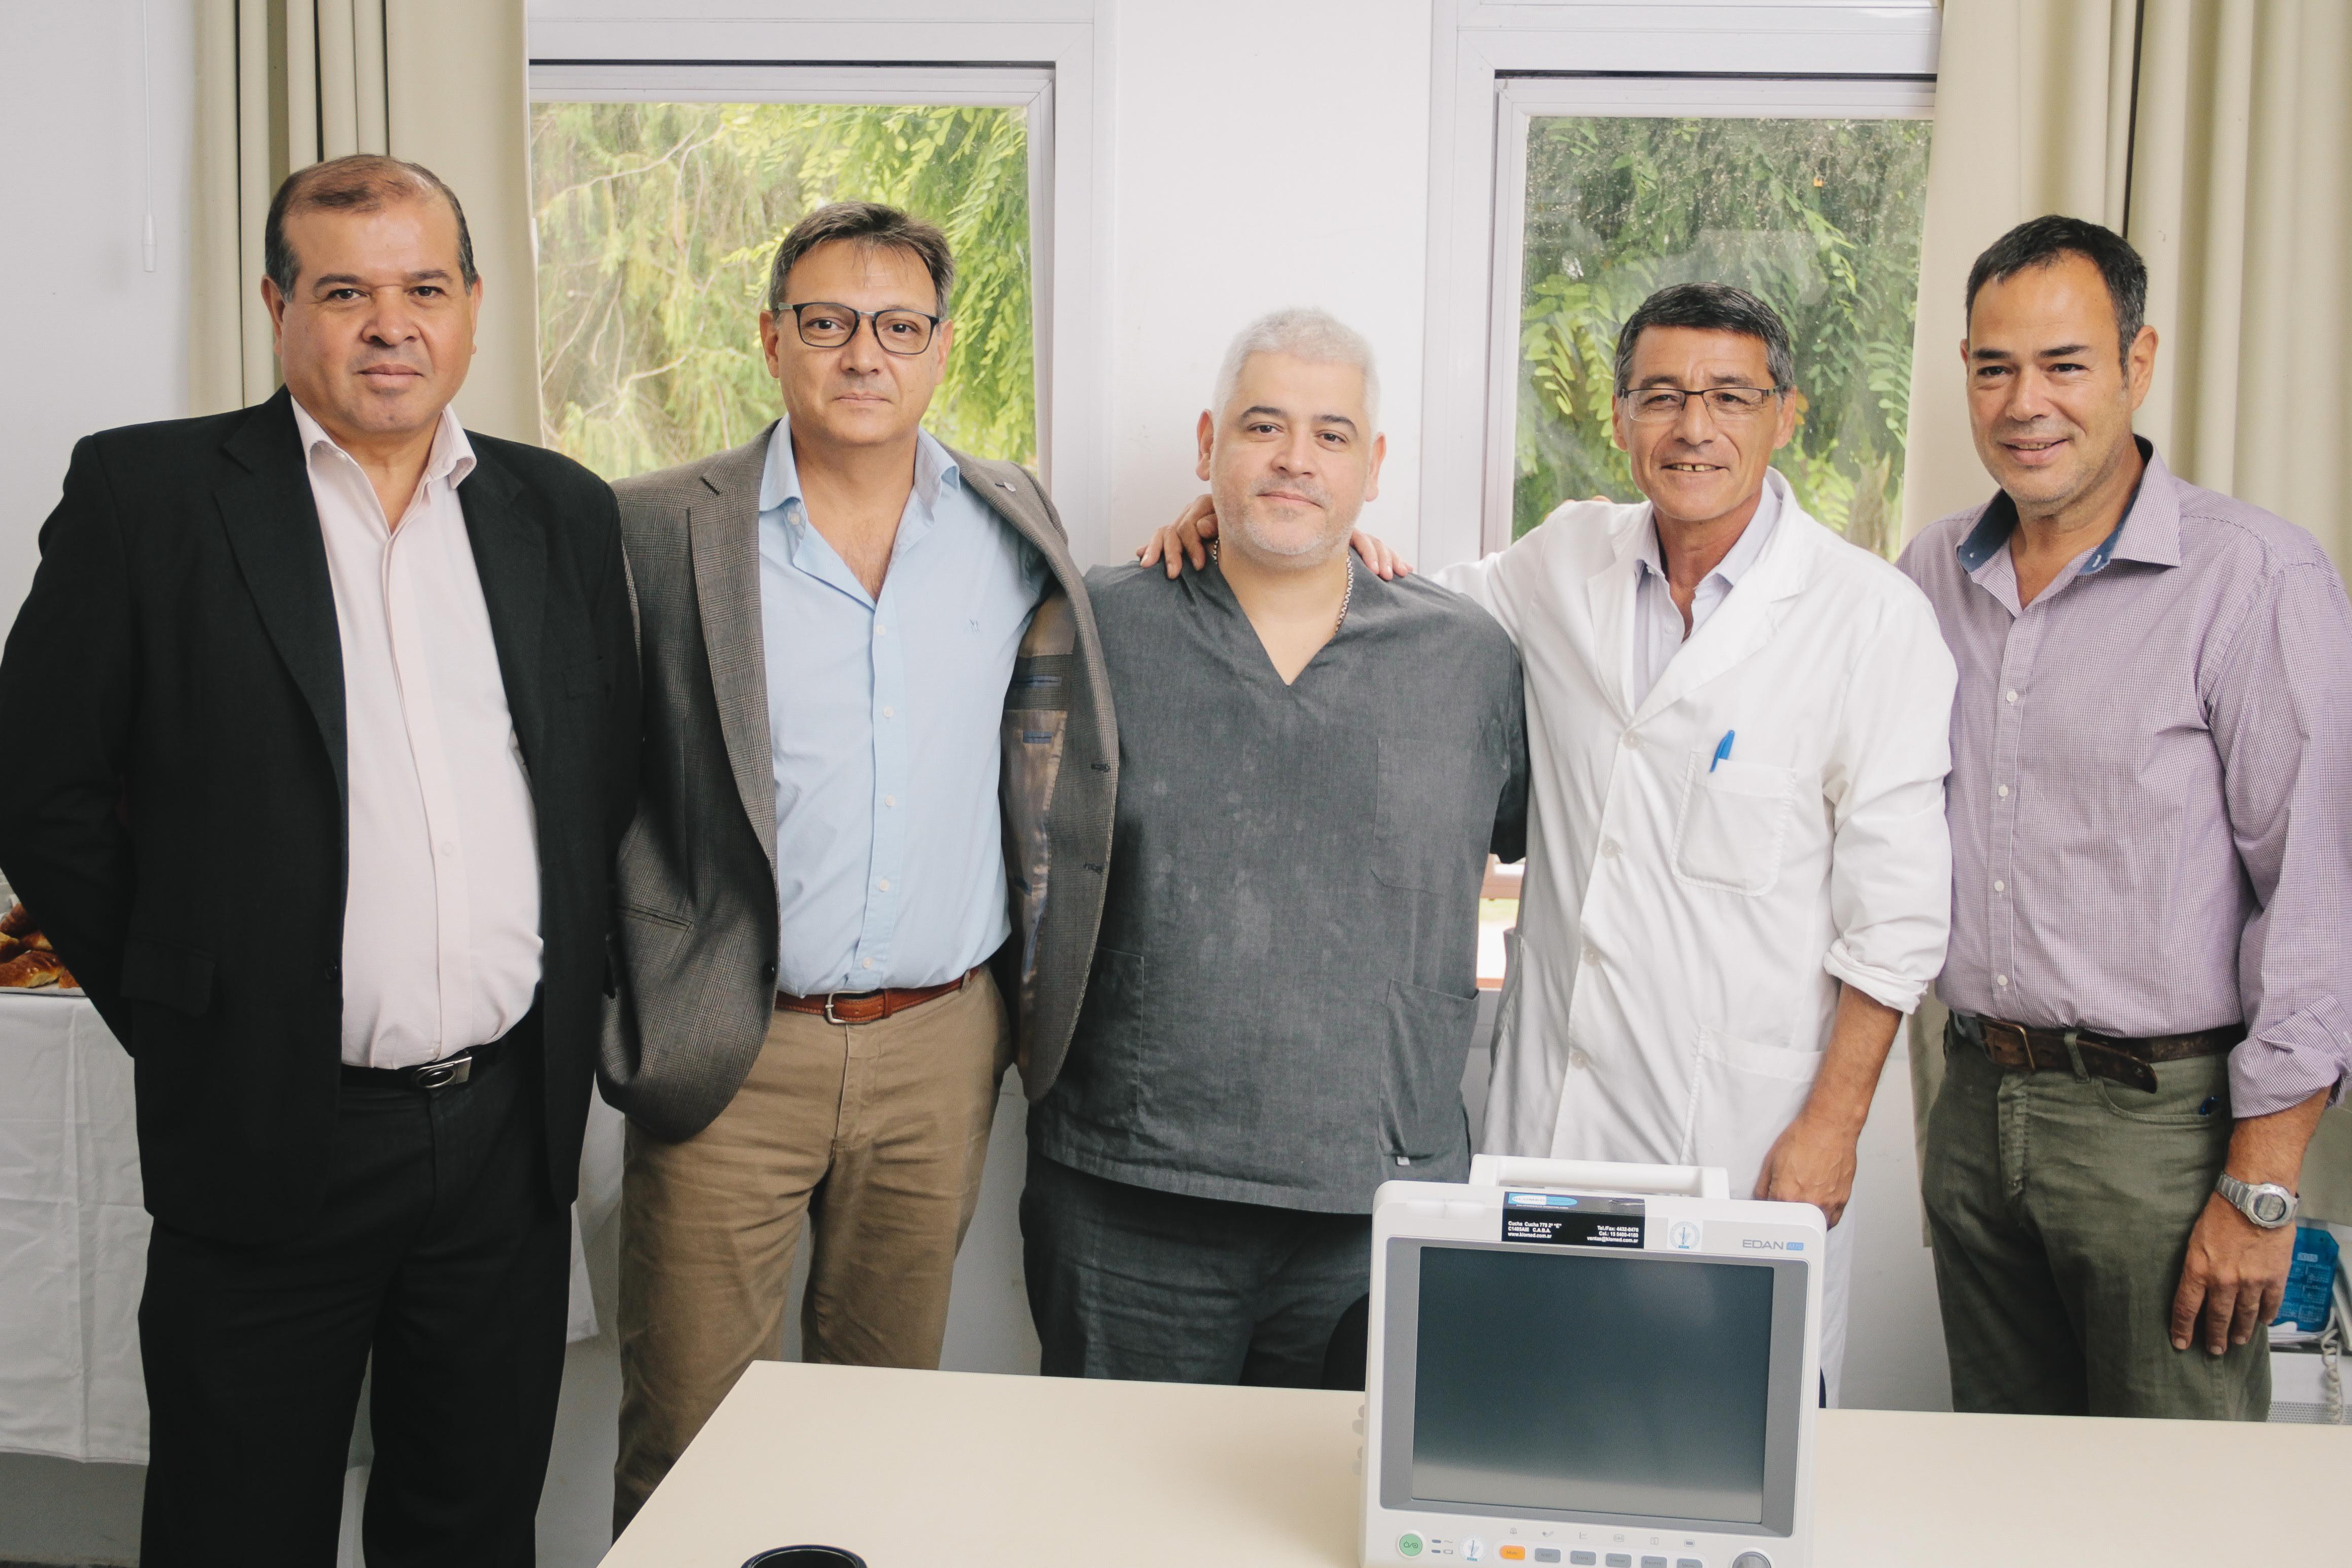 La SPA donó un monitor multiparámetrico al Hospital Municipal Francisco Caram